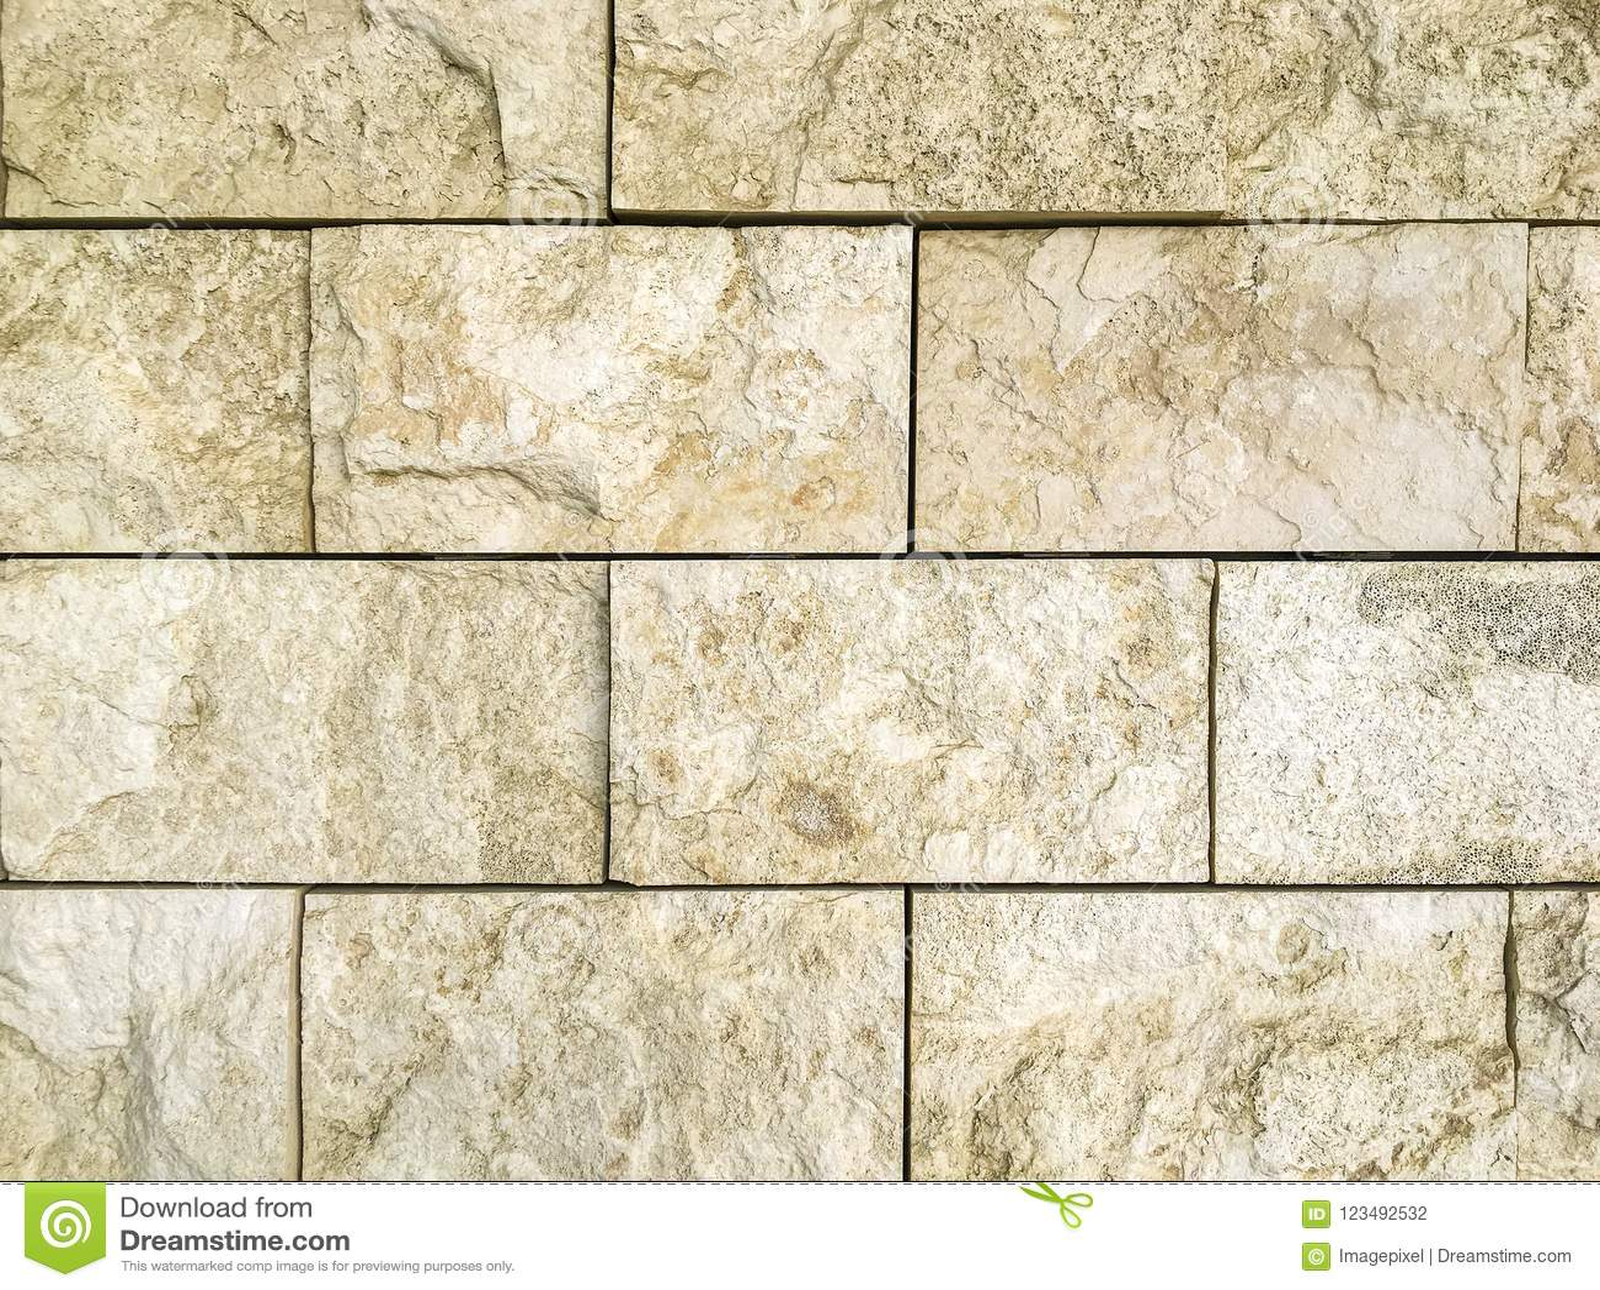 Download Rustic Travertine Stone Background Pattern Stock Photo